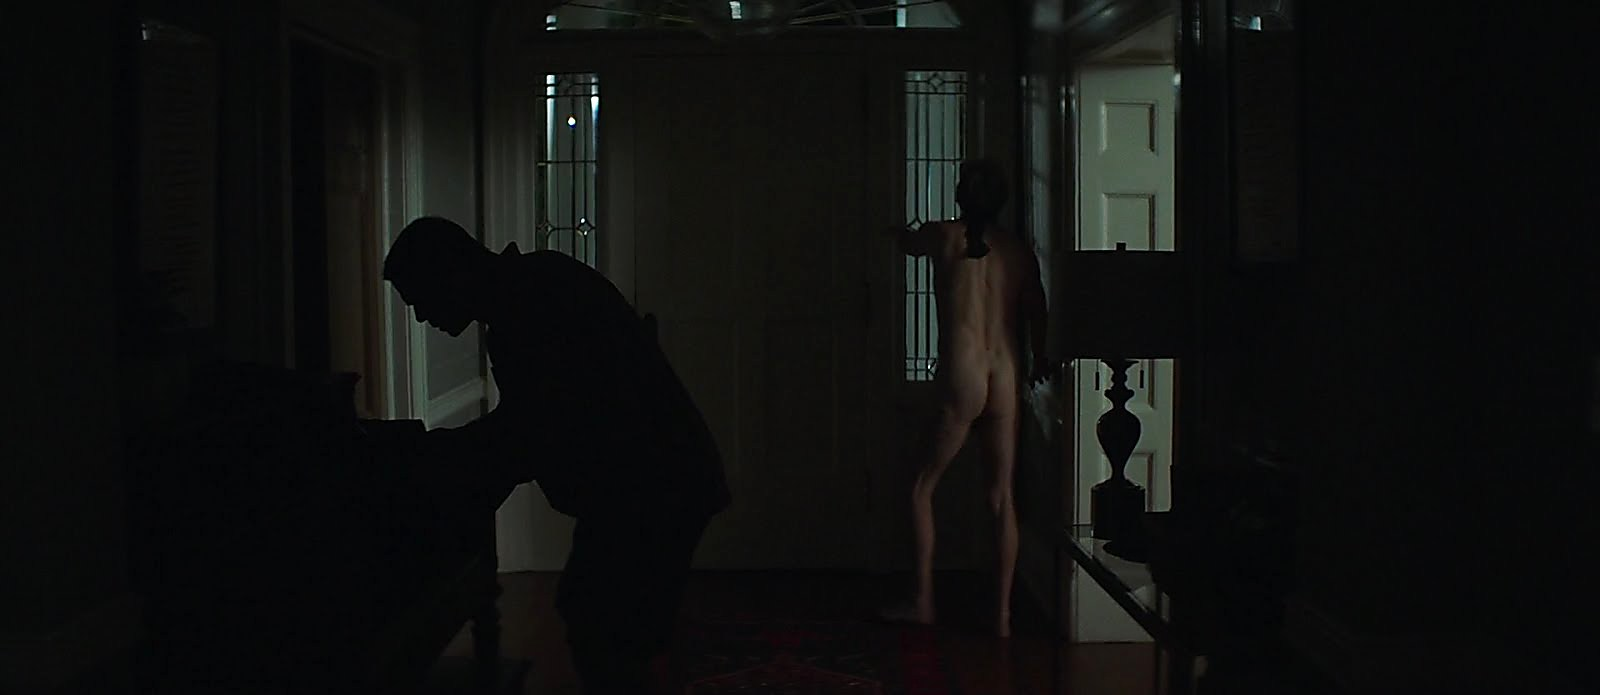 Gary Cole sexy shirtless scene June 20, 2018, 9am